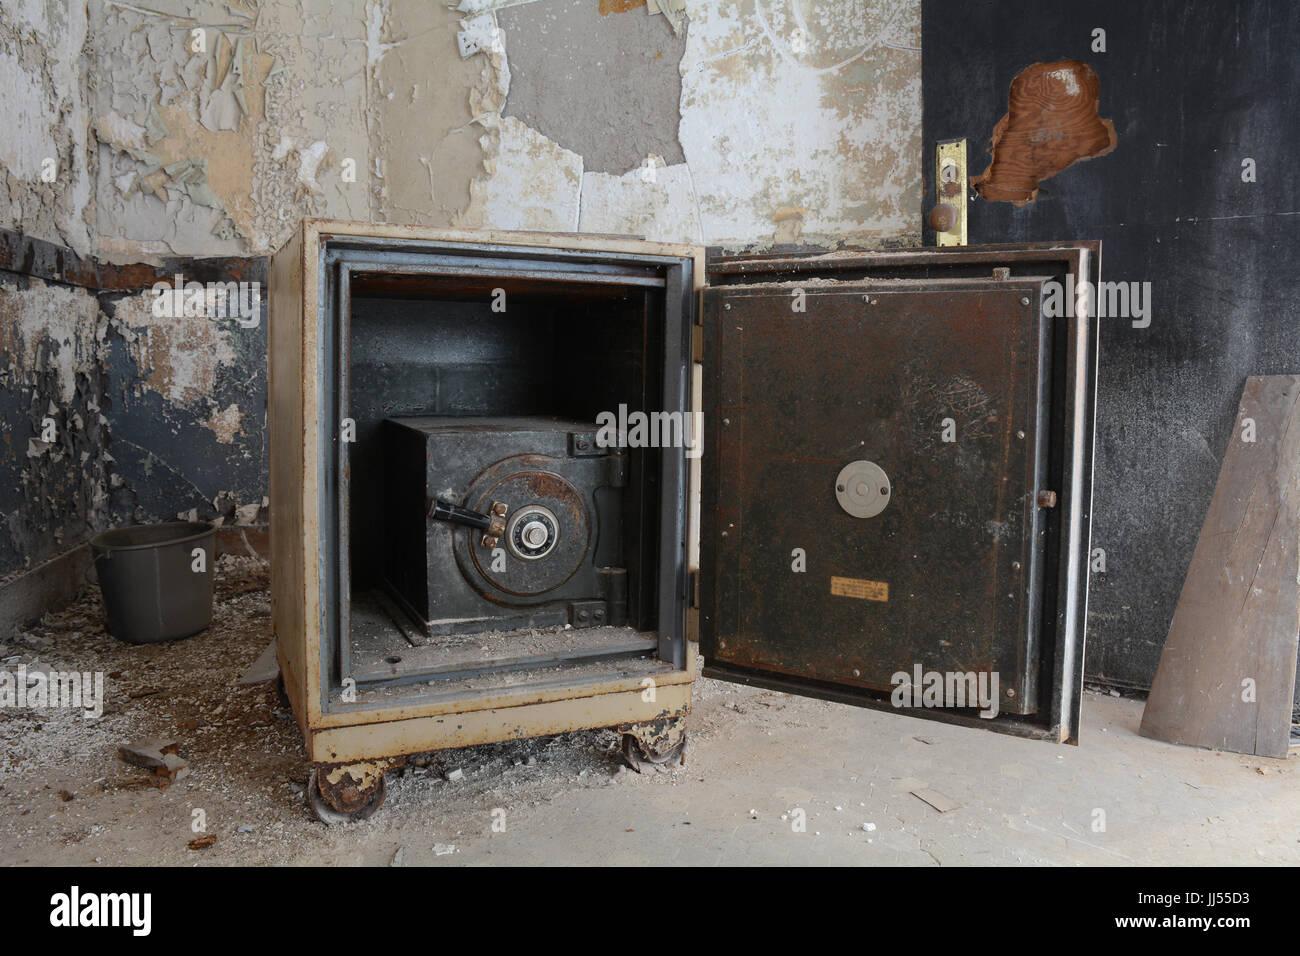 Antique Safe Stock Photos & Antique Safe Stock Images - Alamy